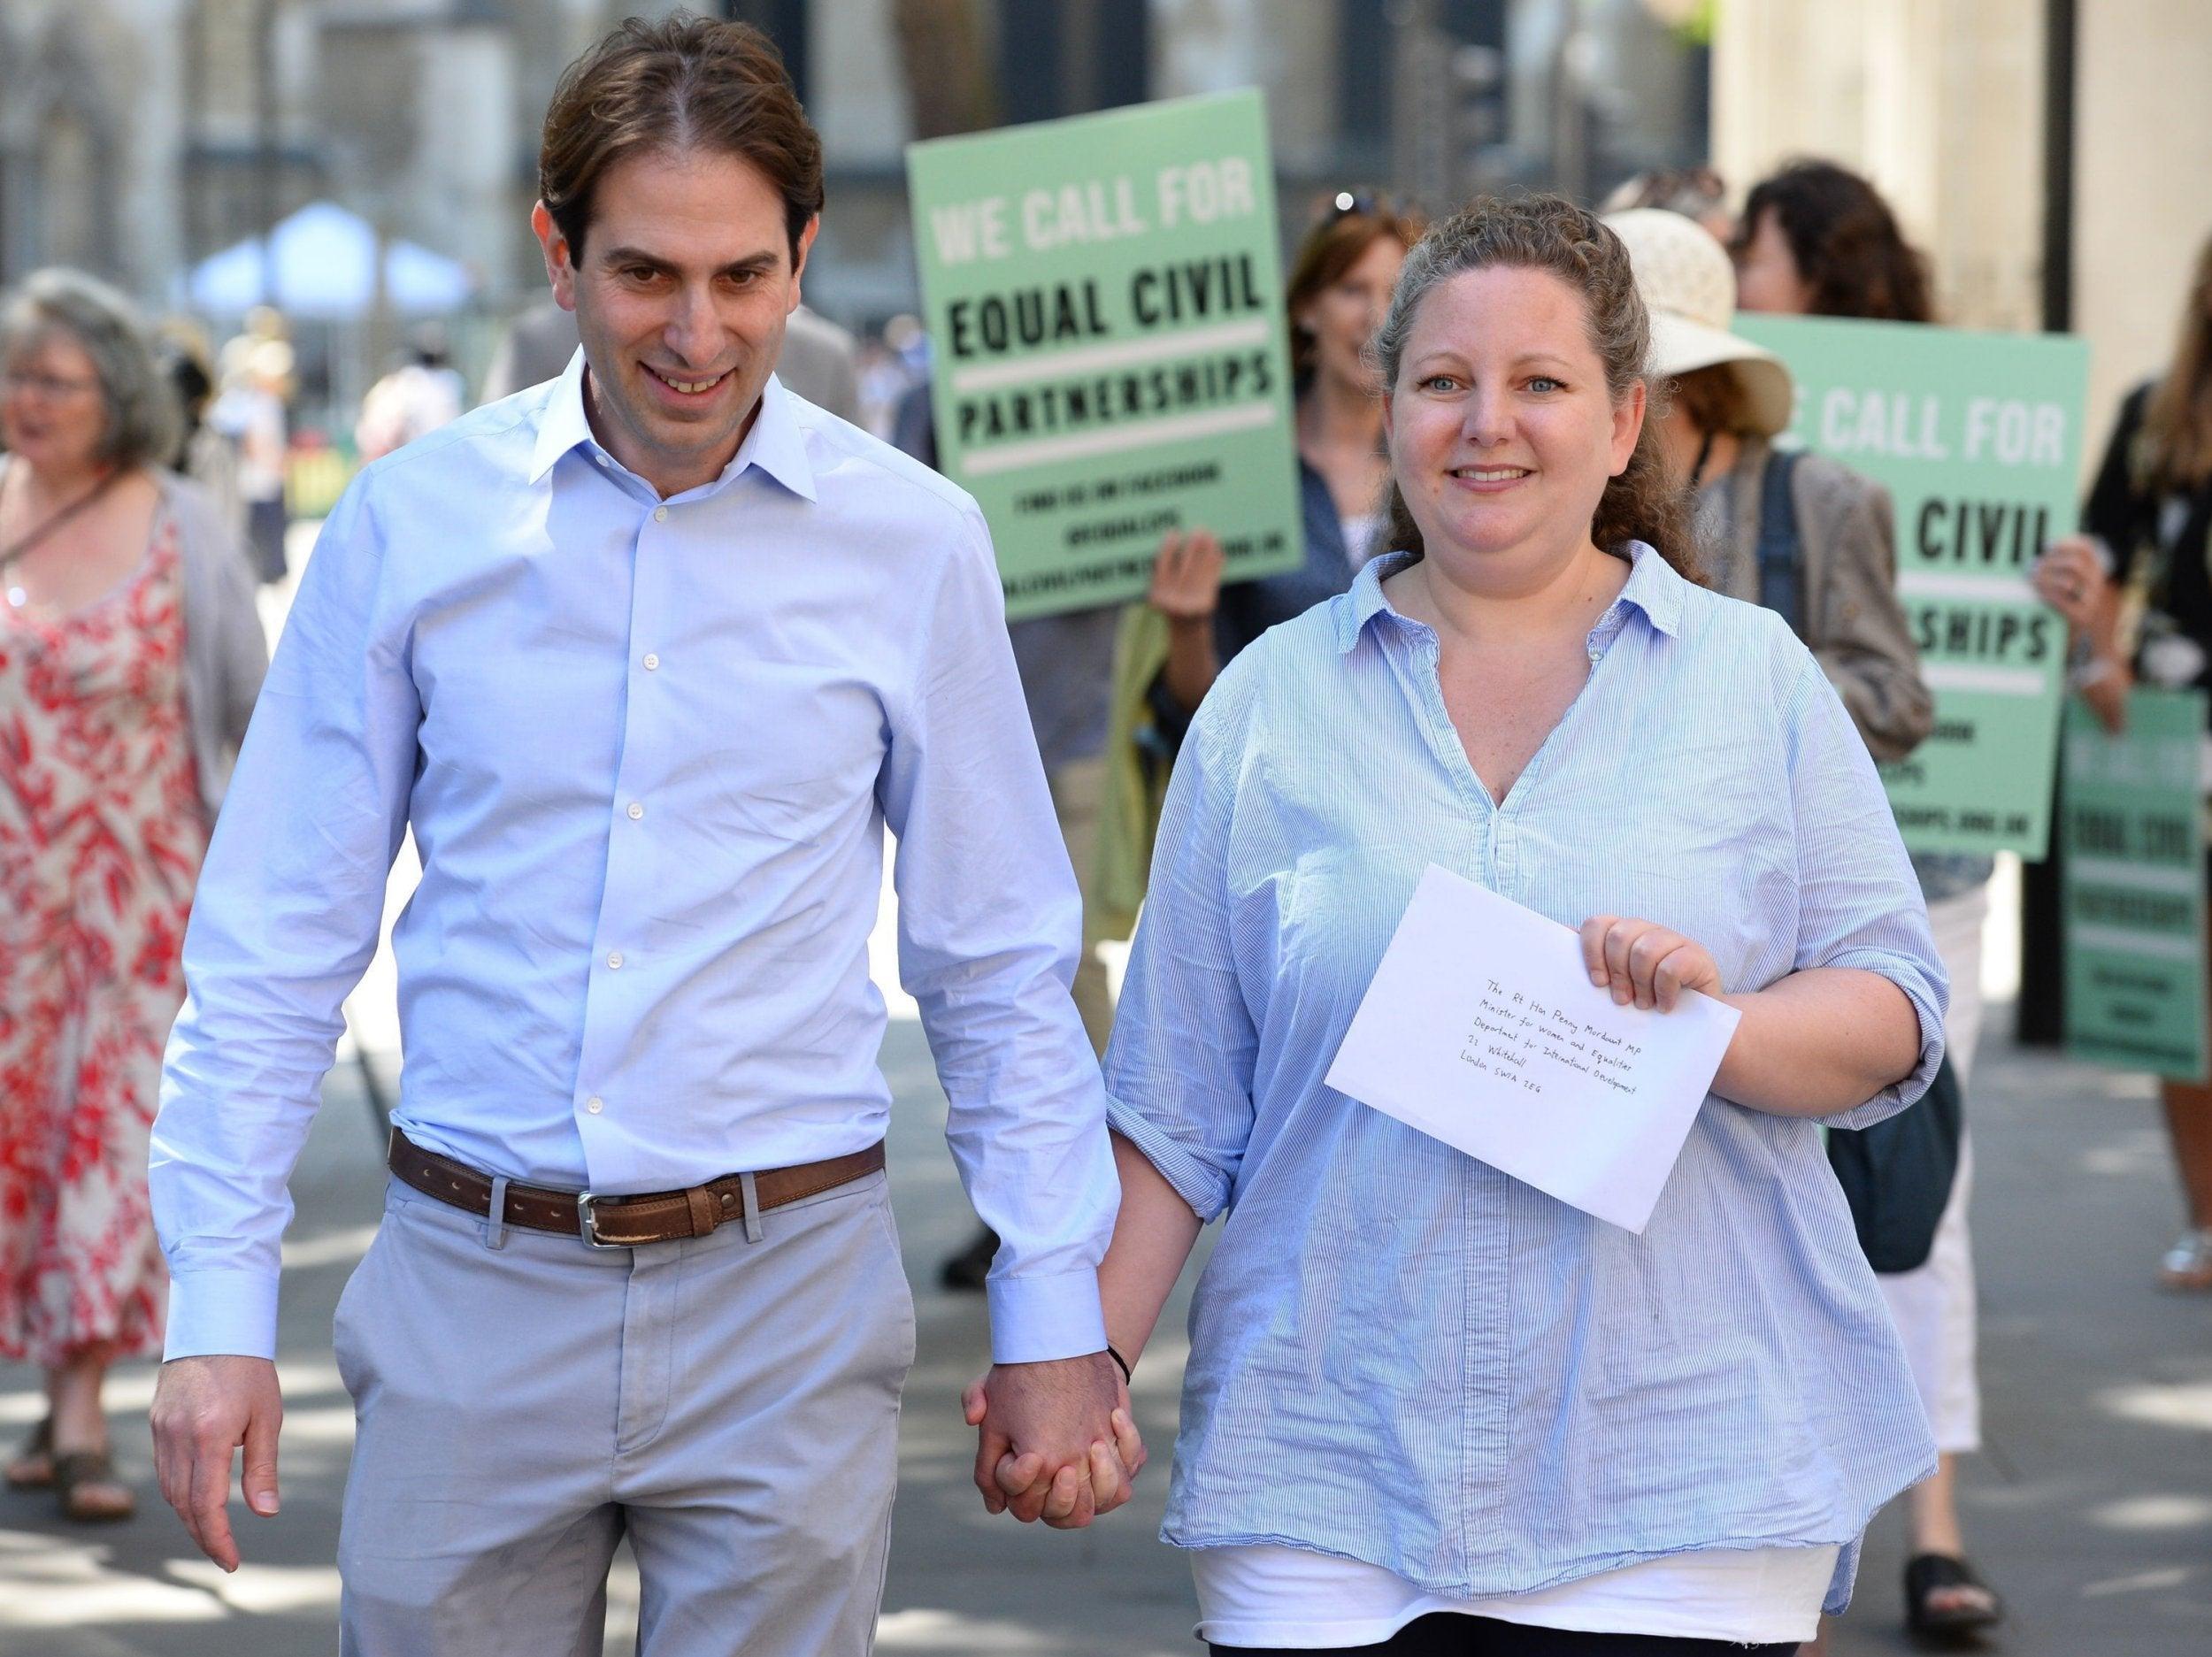 Civil partnership uk heterosexual relations